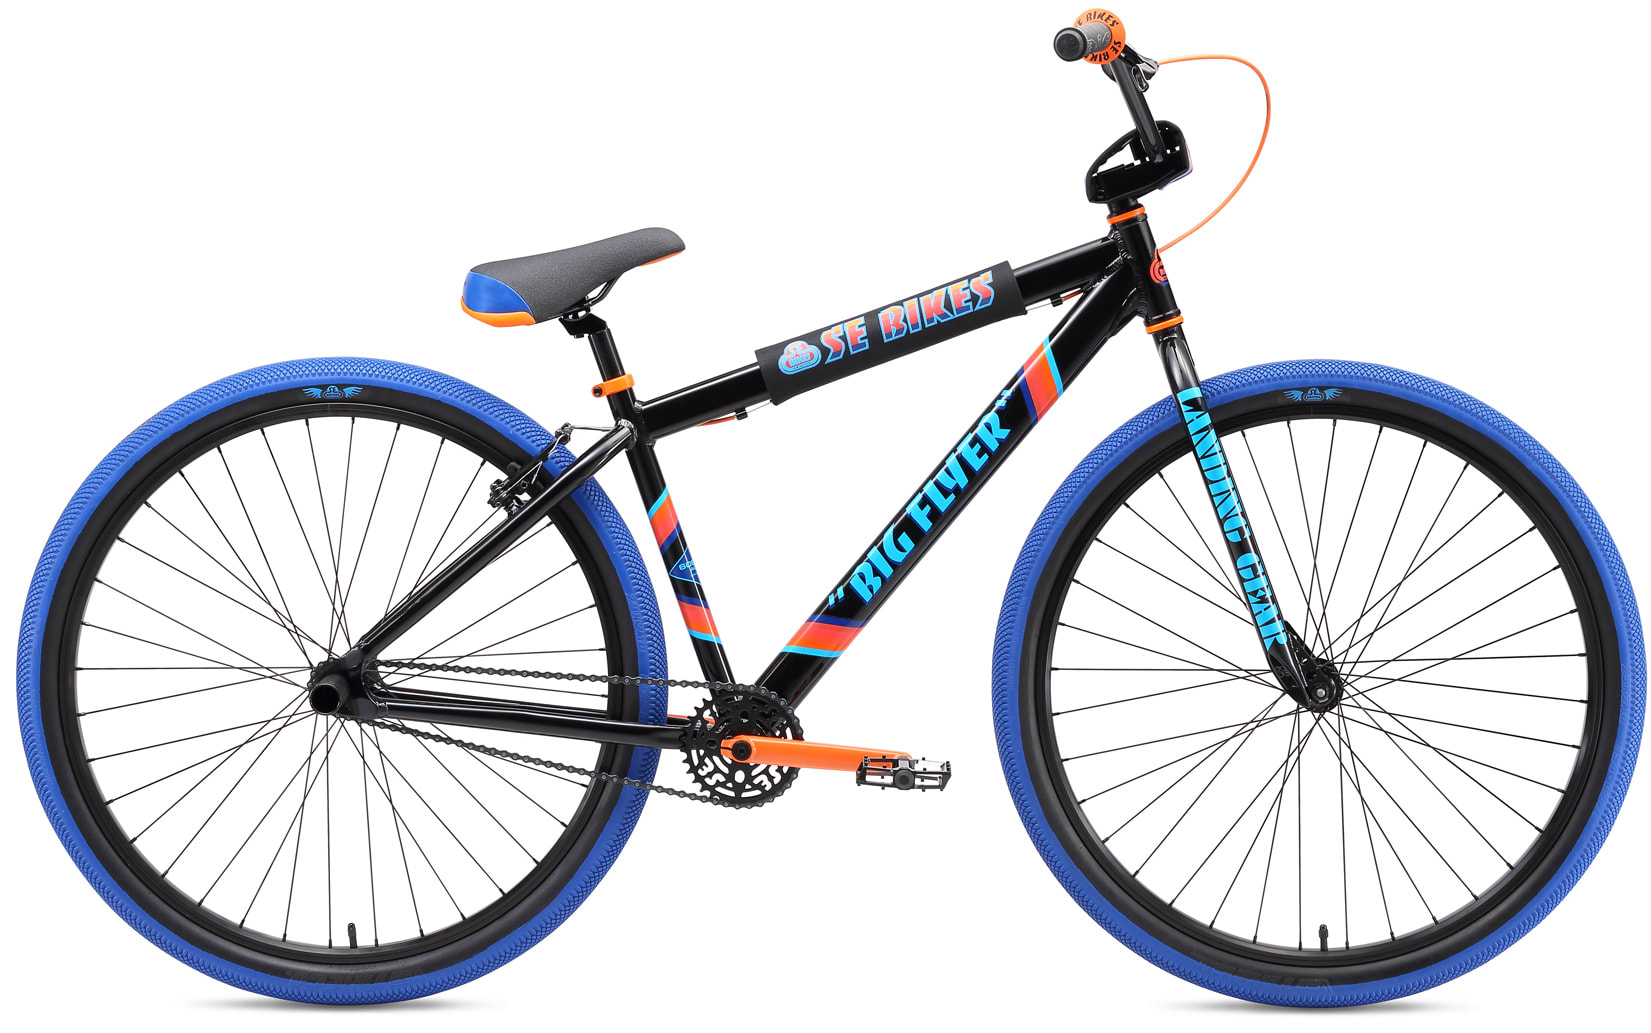 SE Big Flyer 29 BMX Bike 2018